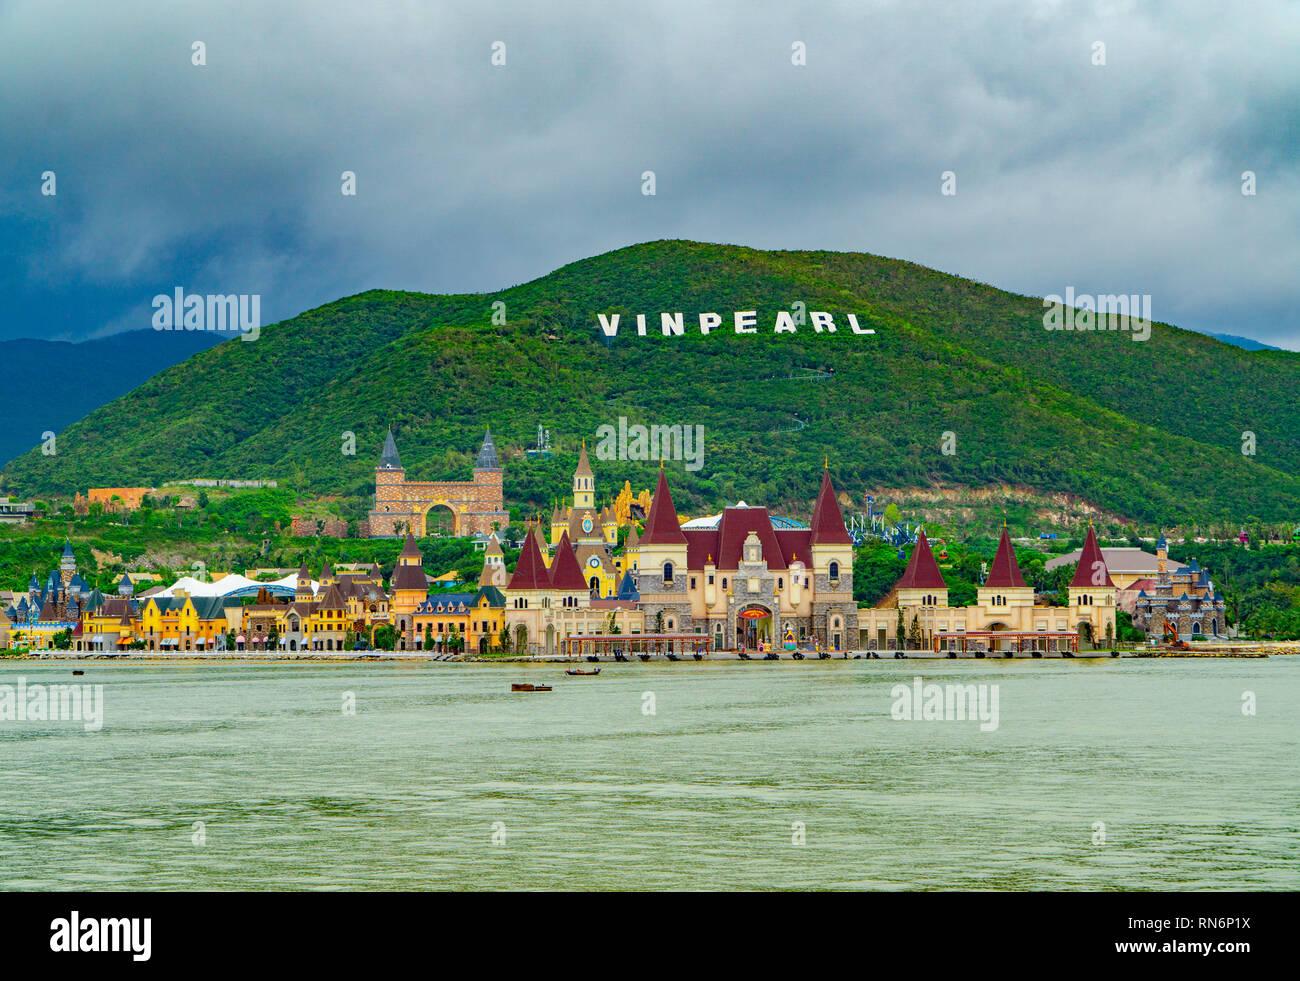 Vinpearl land in Nha Trang Vietnam - Stock Image